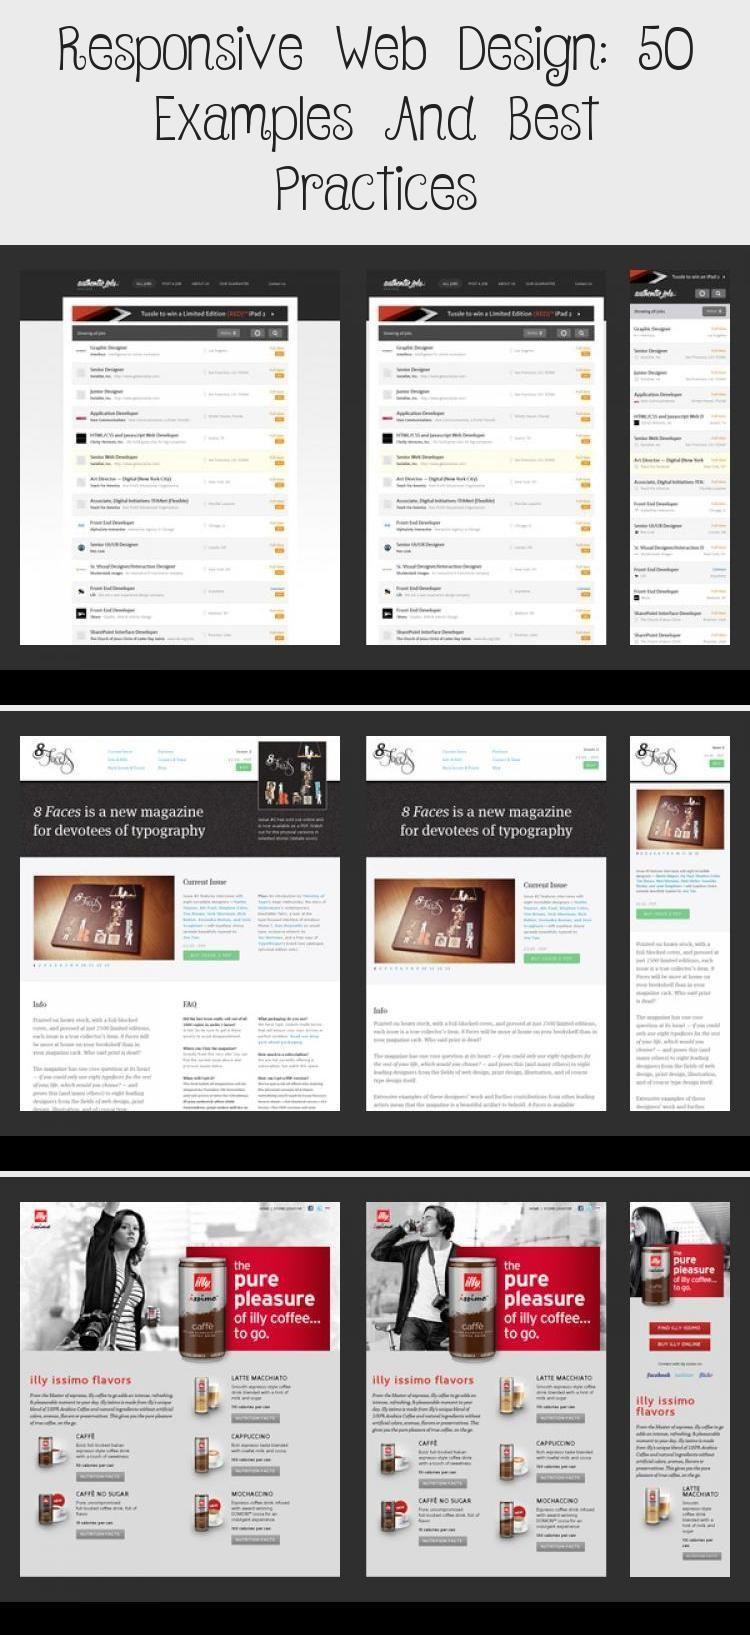 En Blog En Blog In 2020 Web Design Web Design Examples Responsive Design Examples